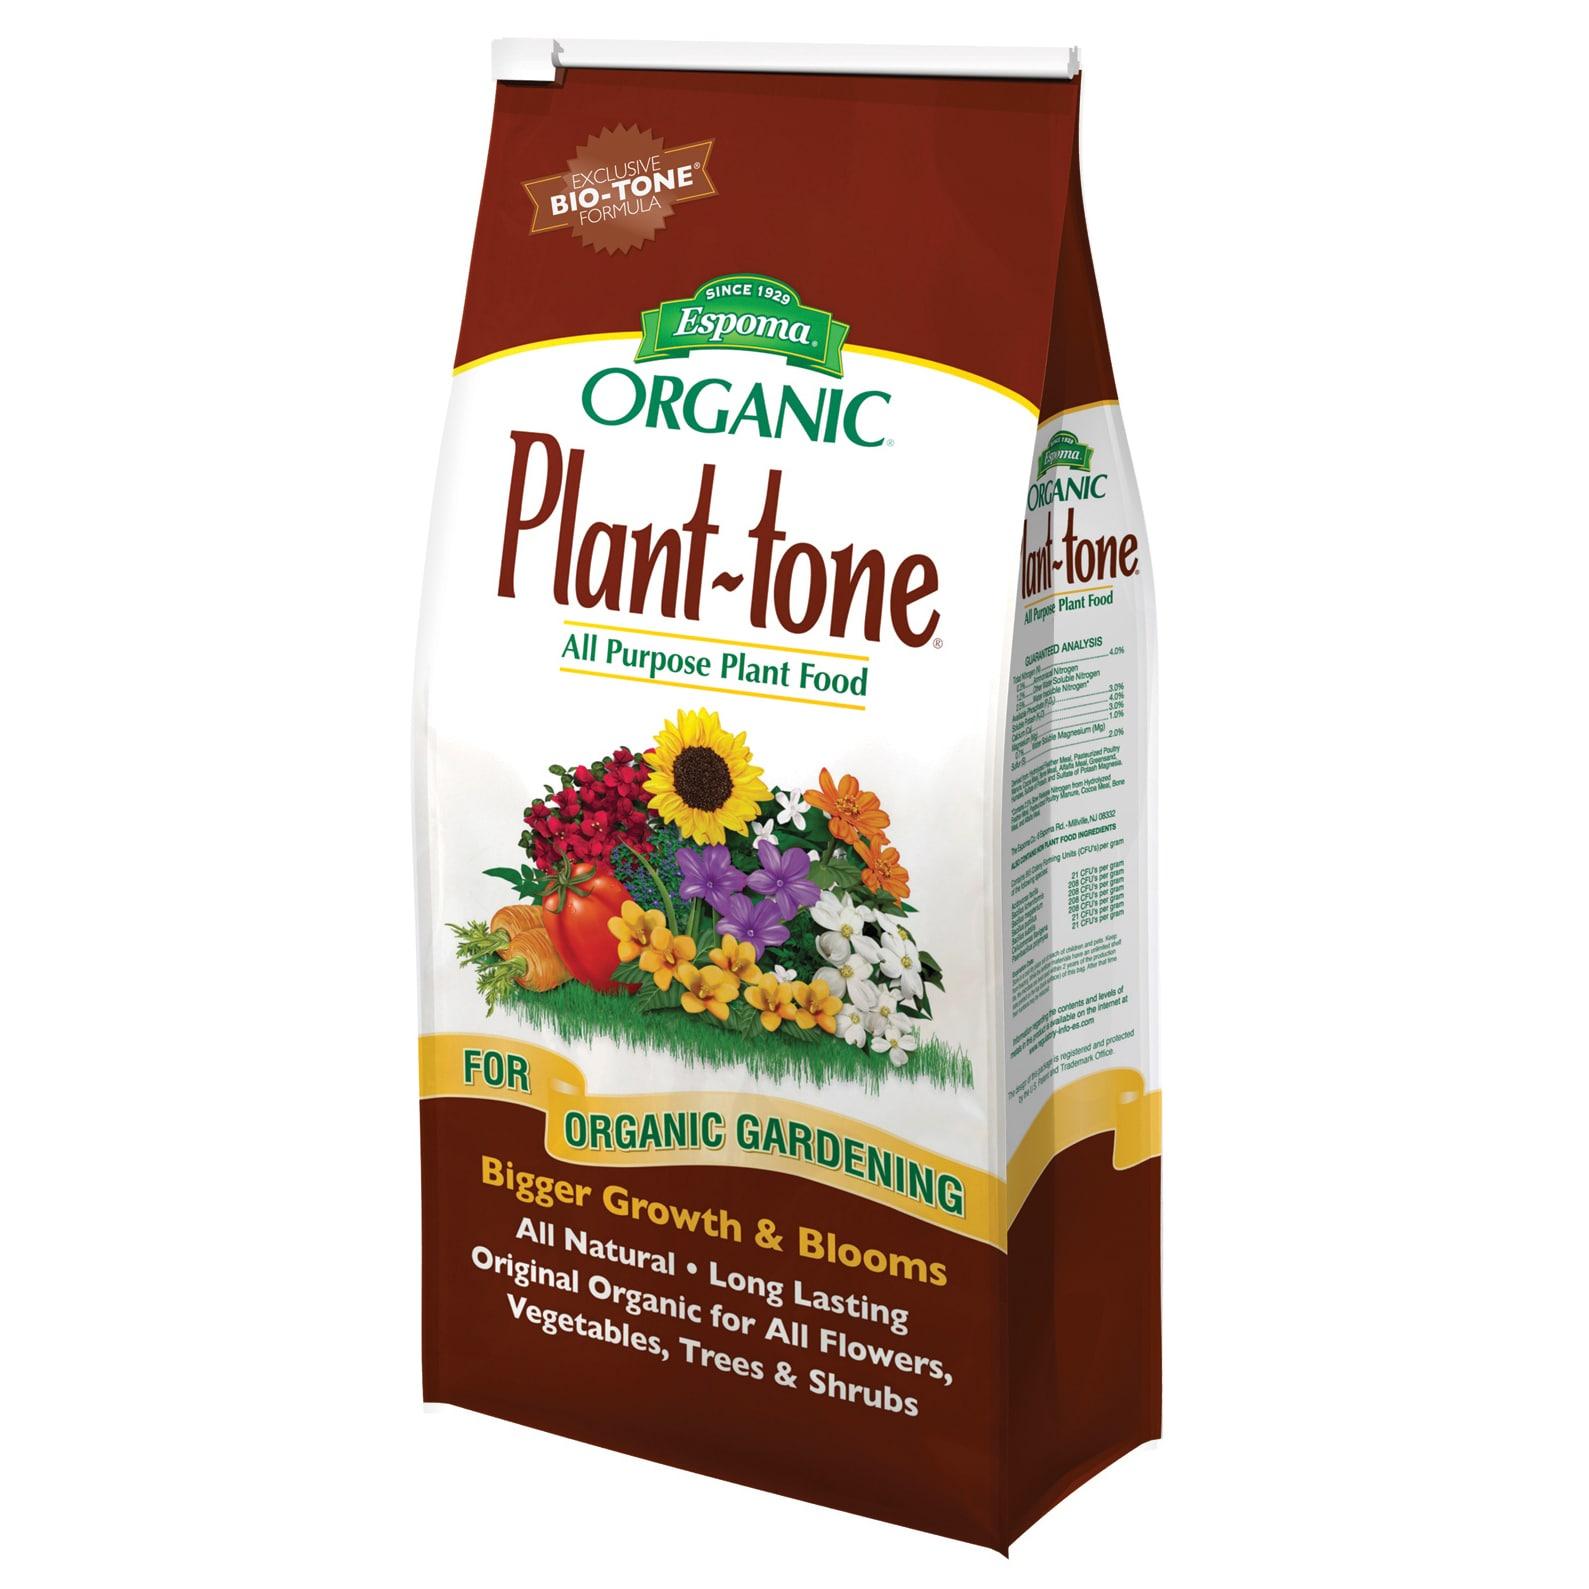 ESPOMA PT4 4-pounds Plant-tone Organic 5-3-3 Plant Food (...